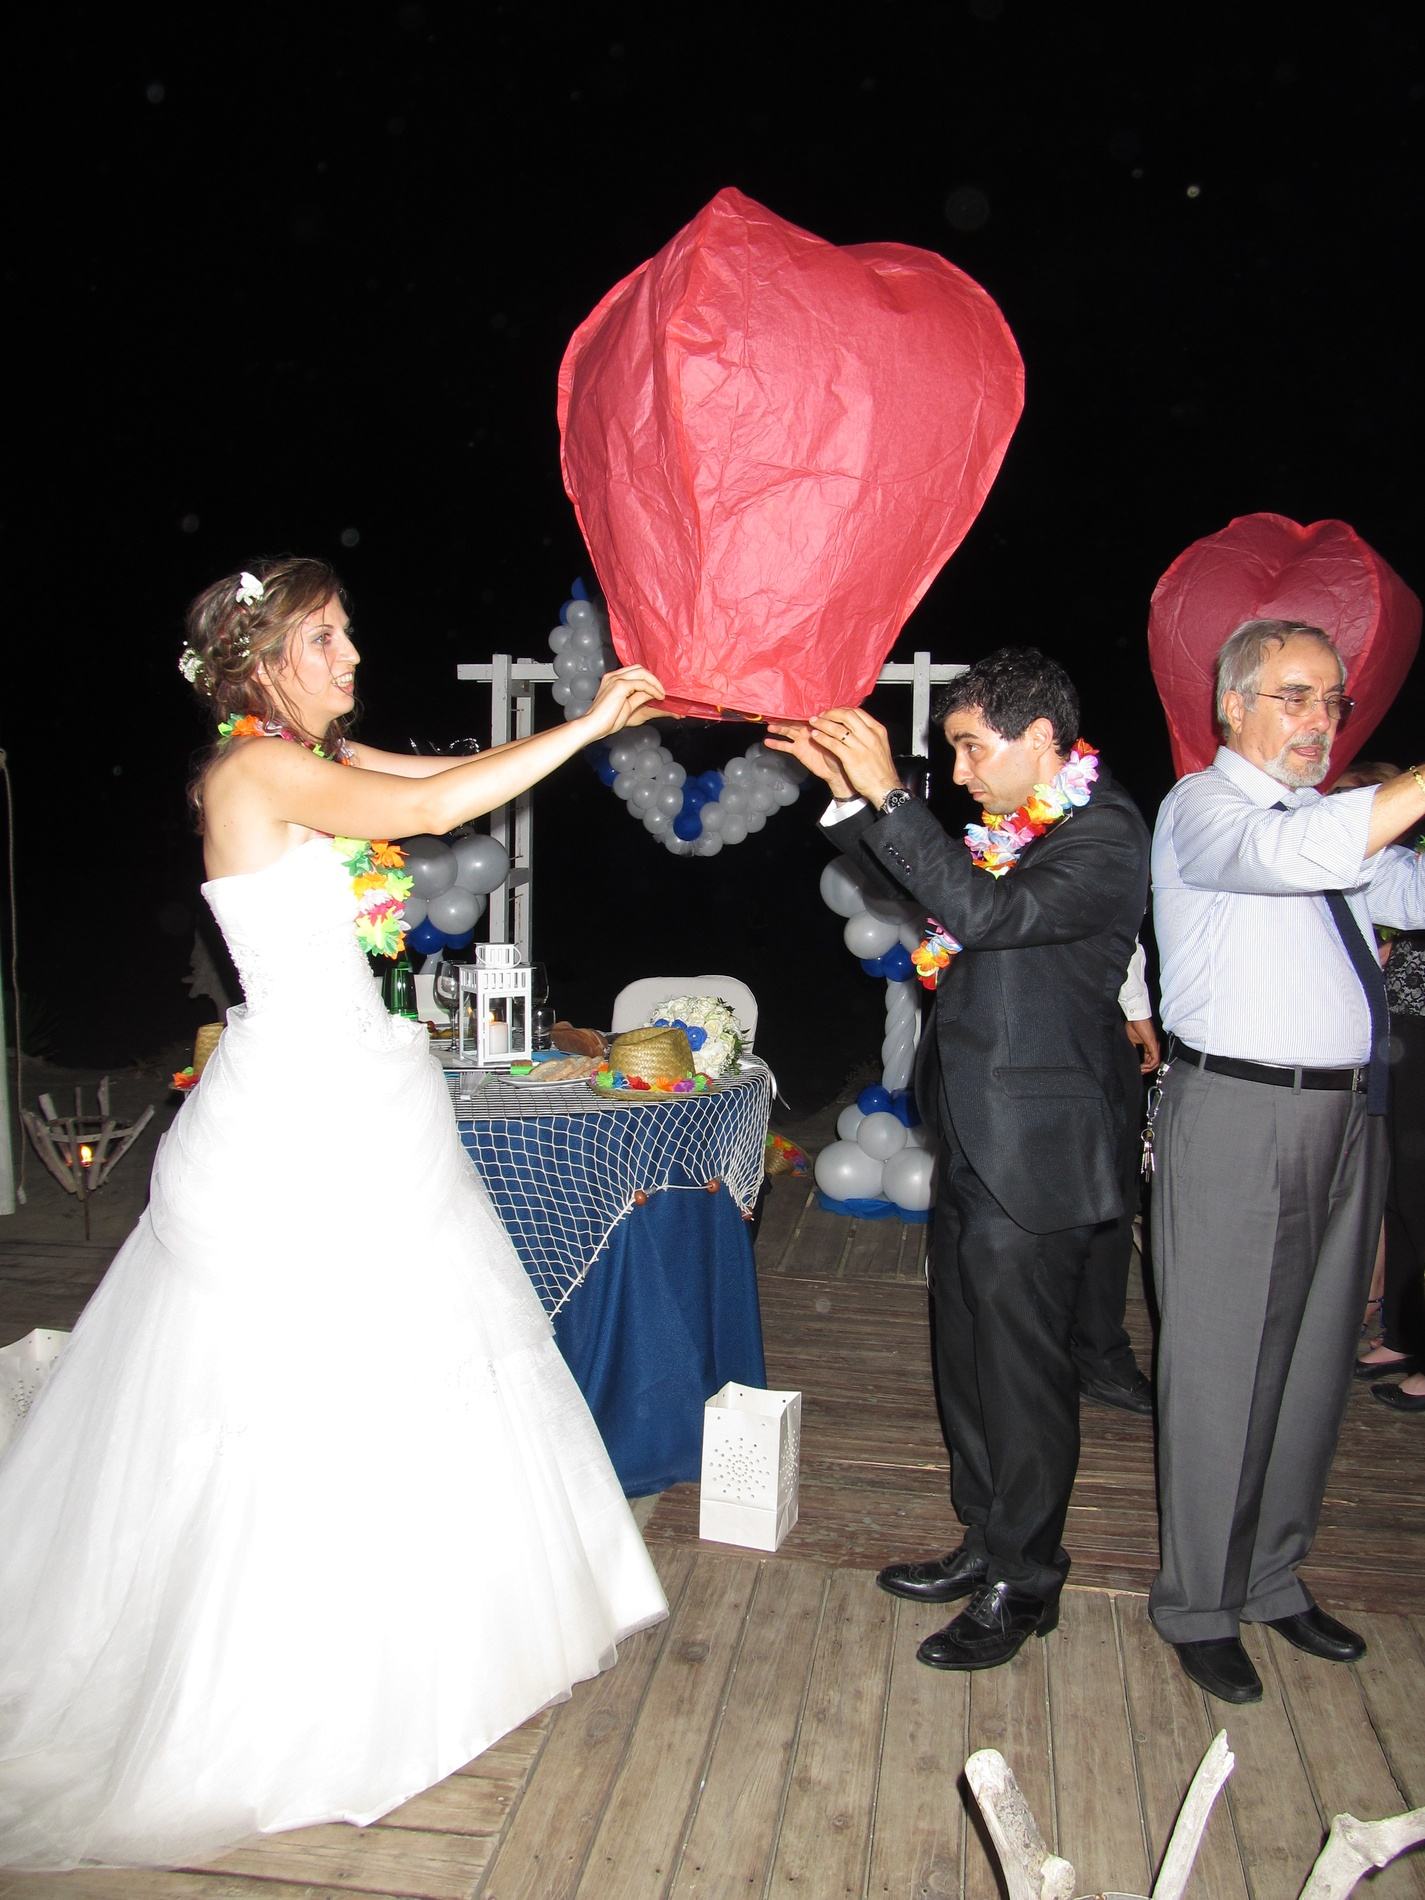 matrimonio-ilaria-torrisi-e-marco-di-lucia-2015-08-08-22-50-40